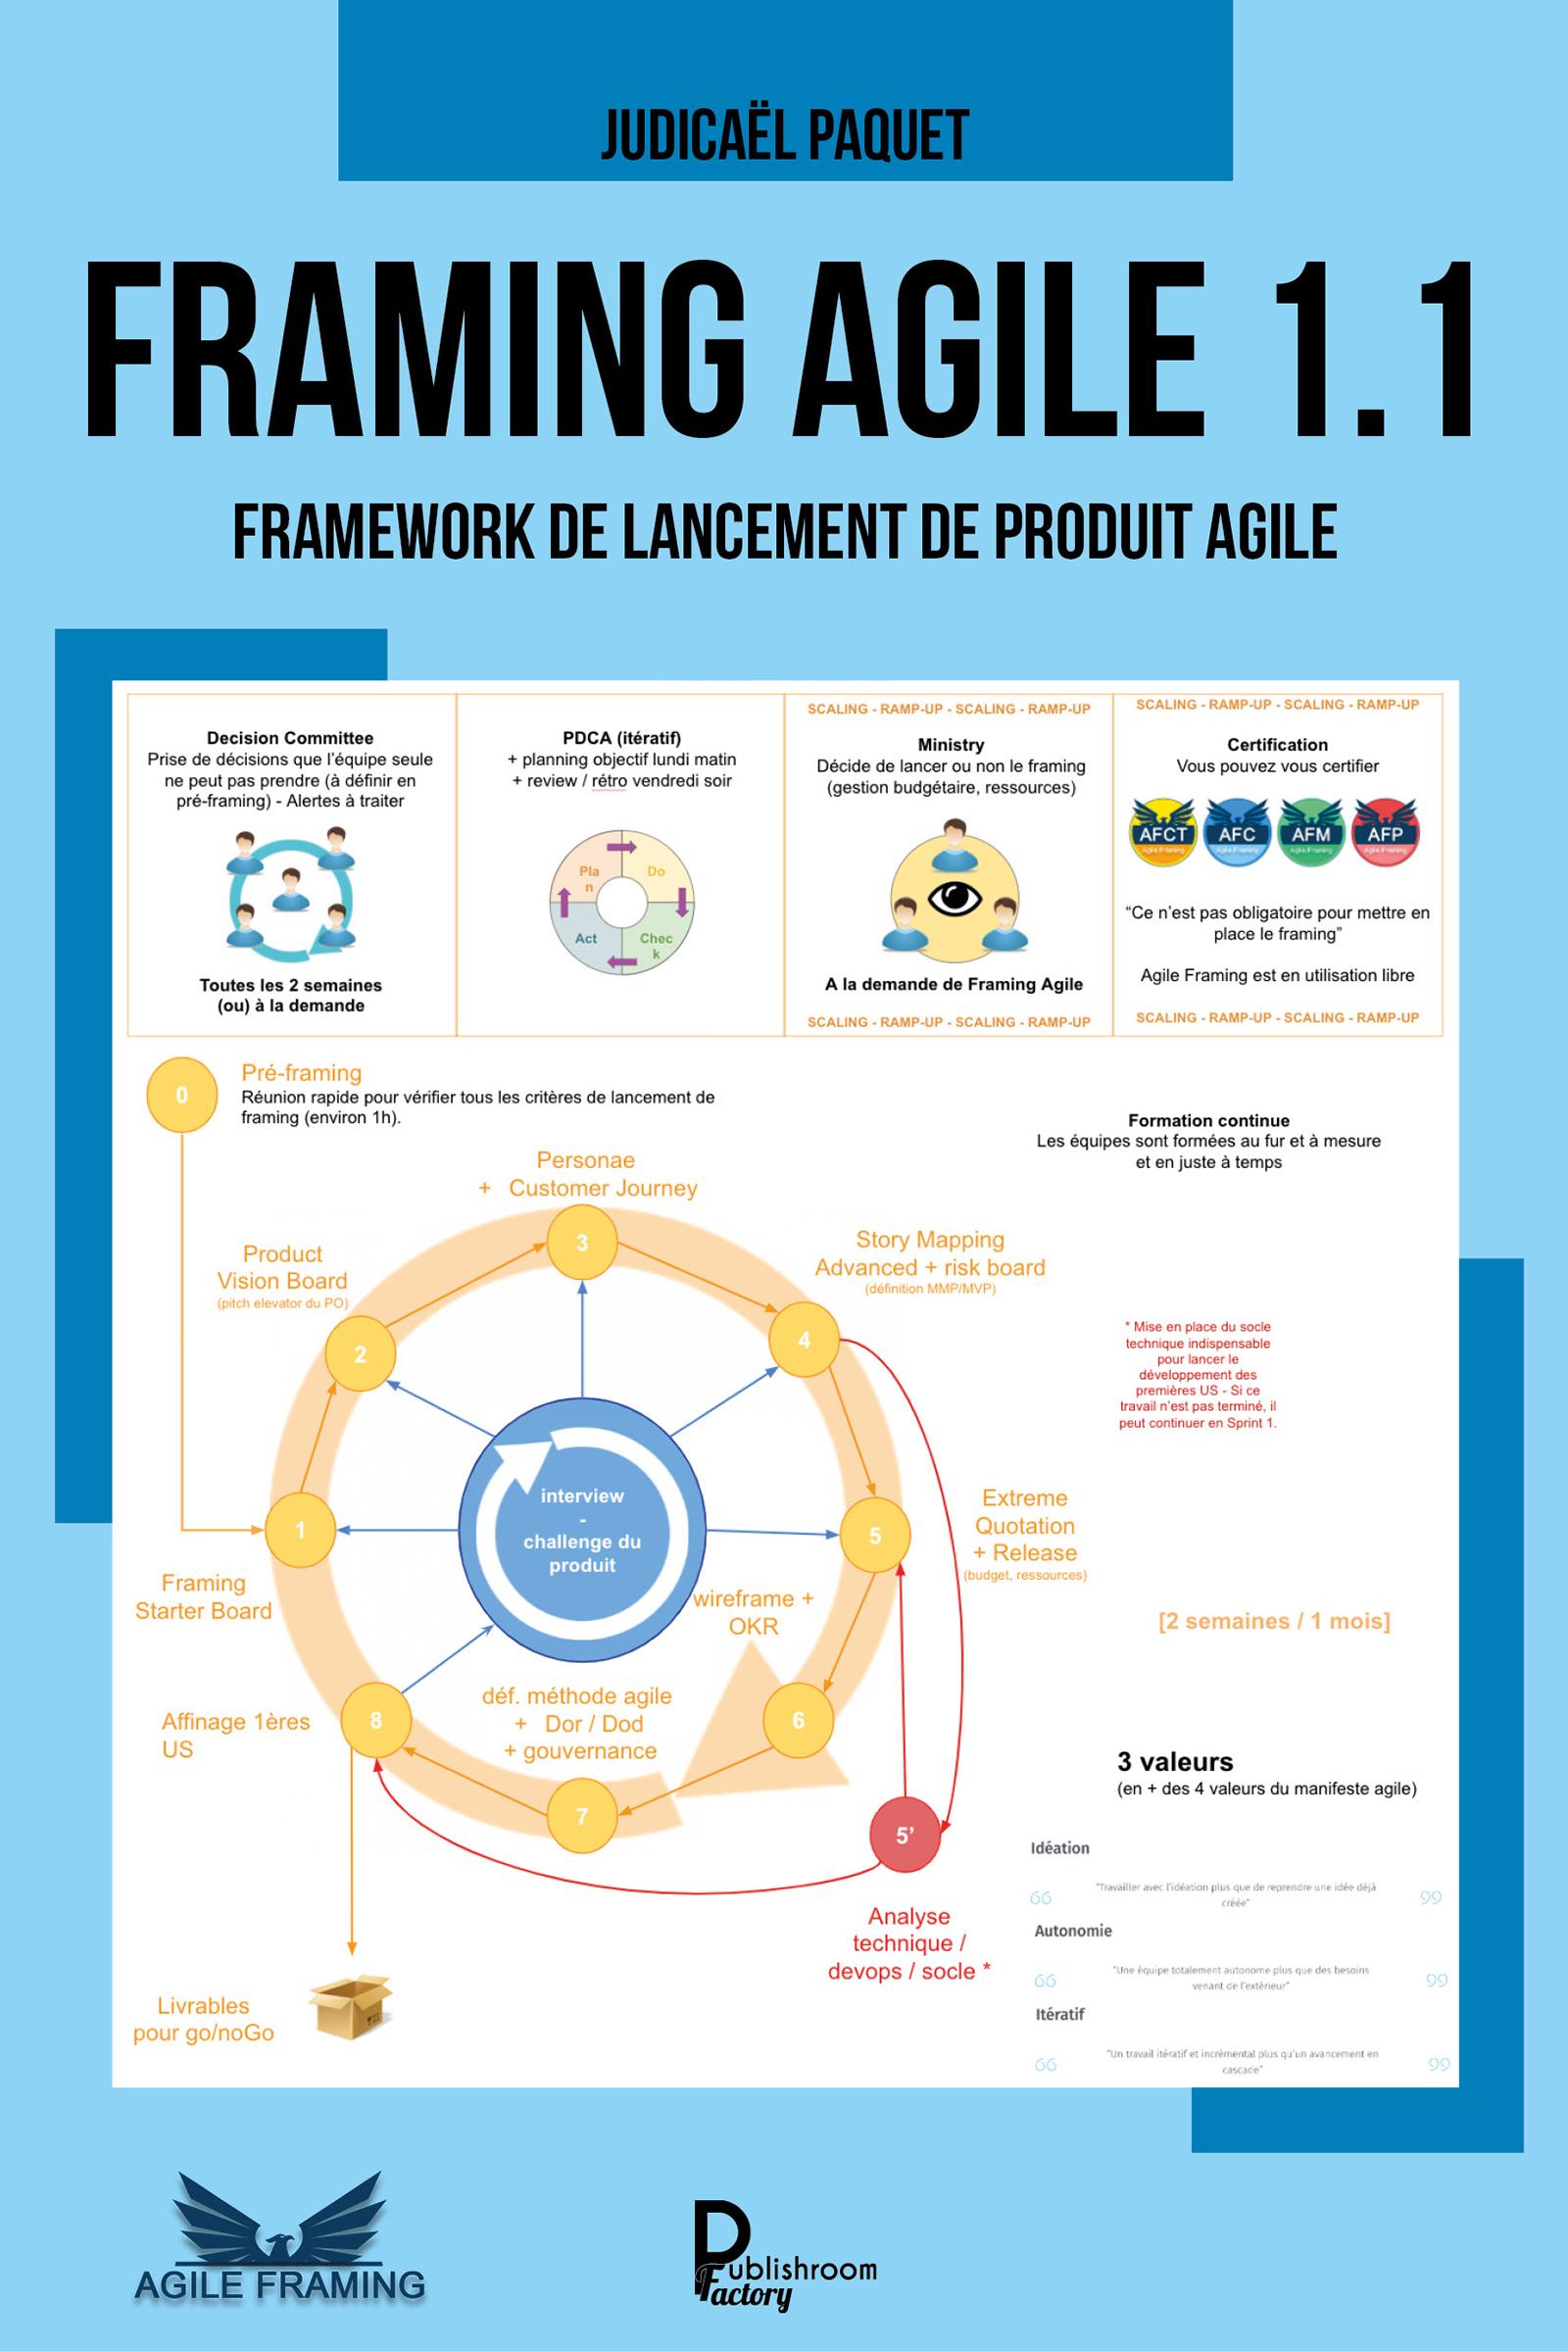 Framing Agile 1.1